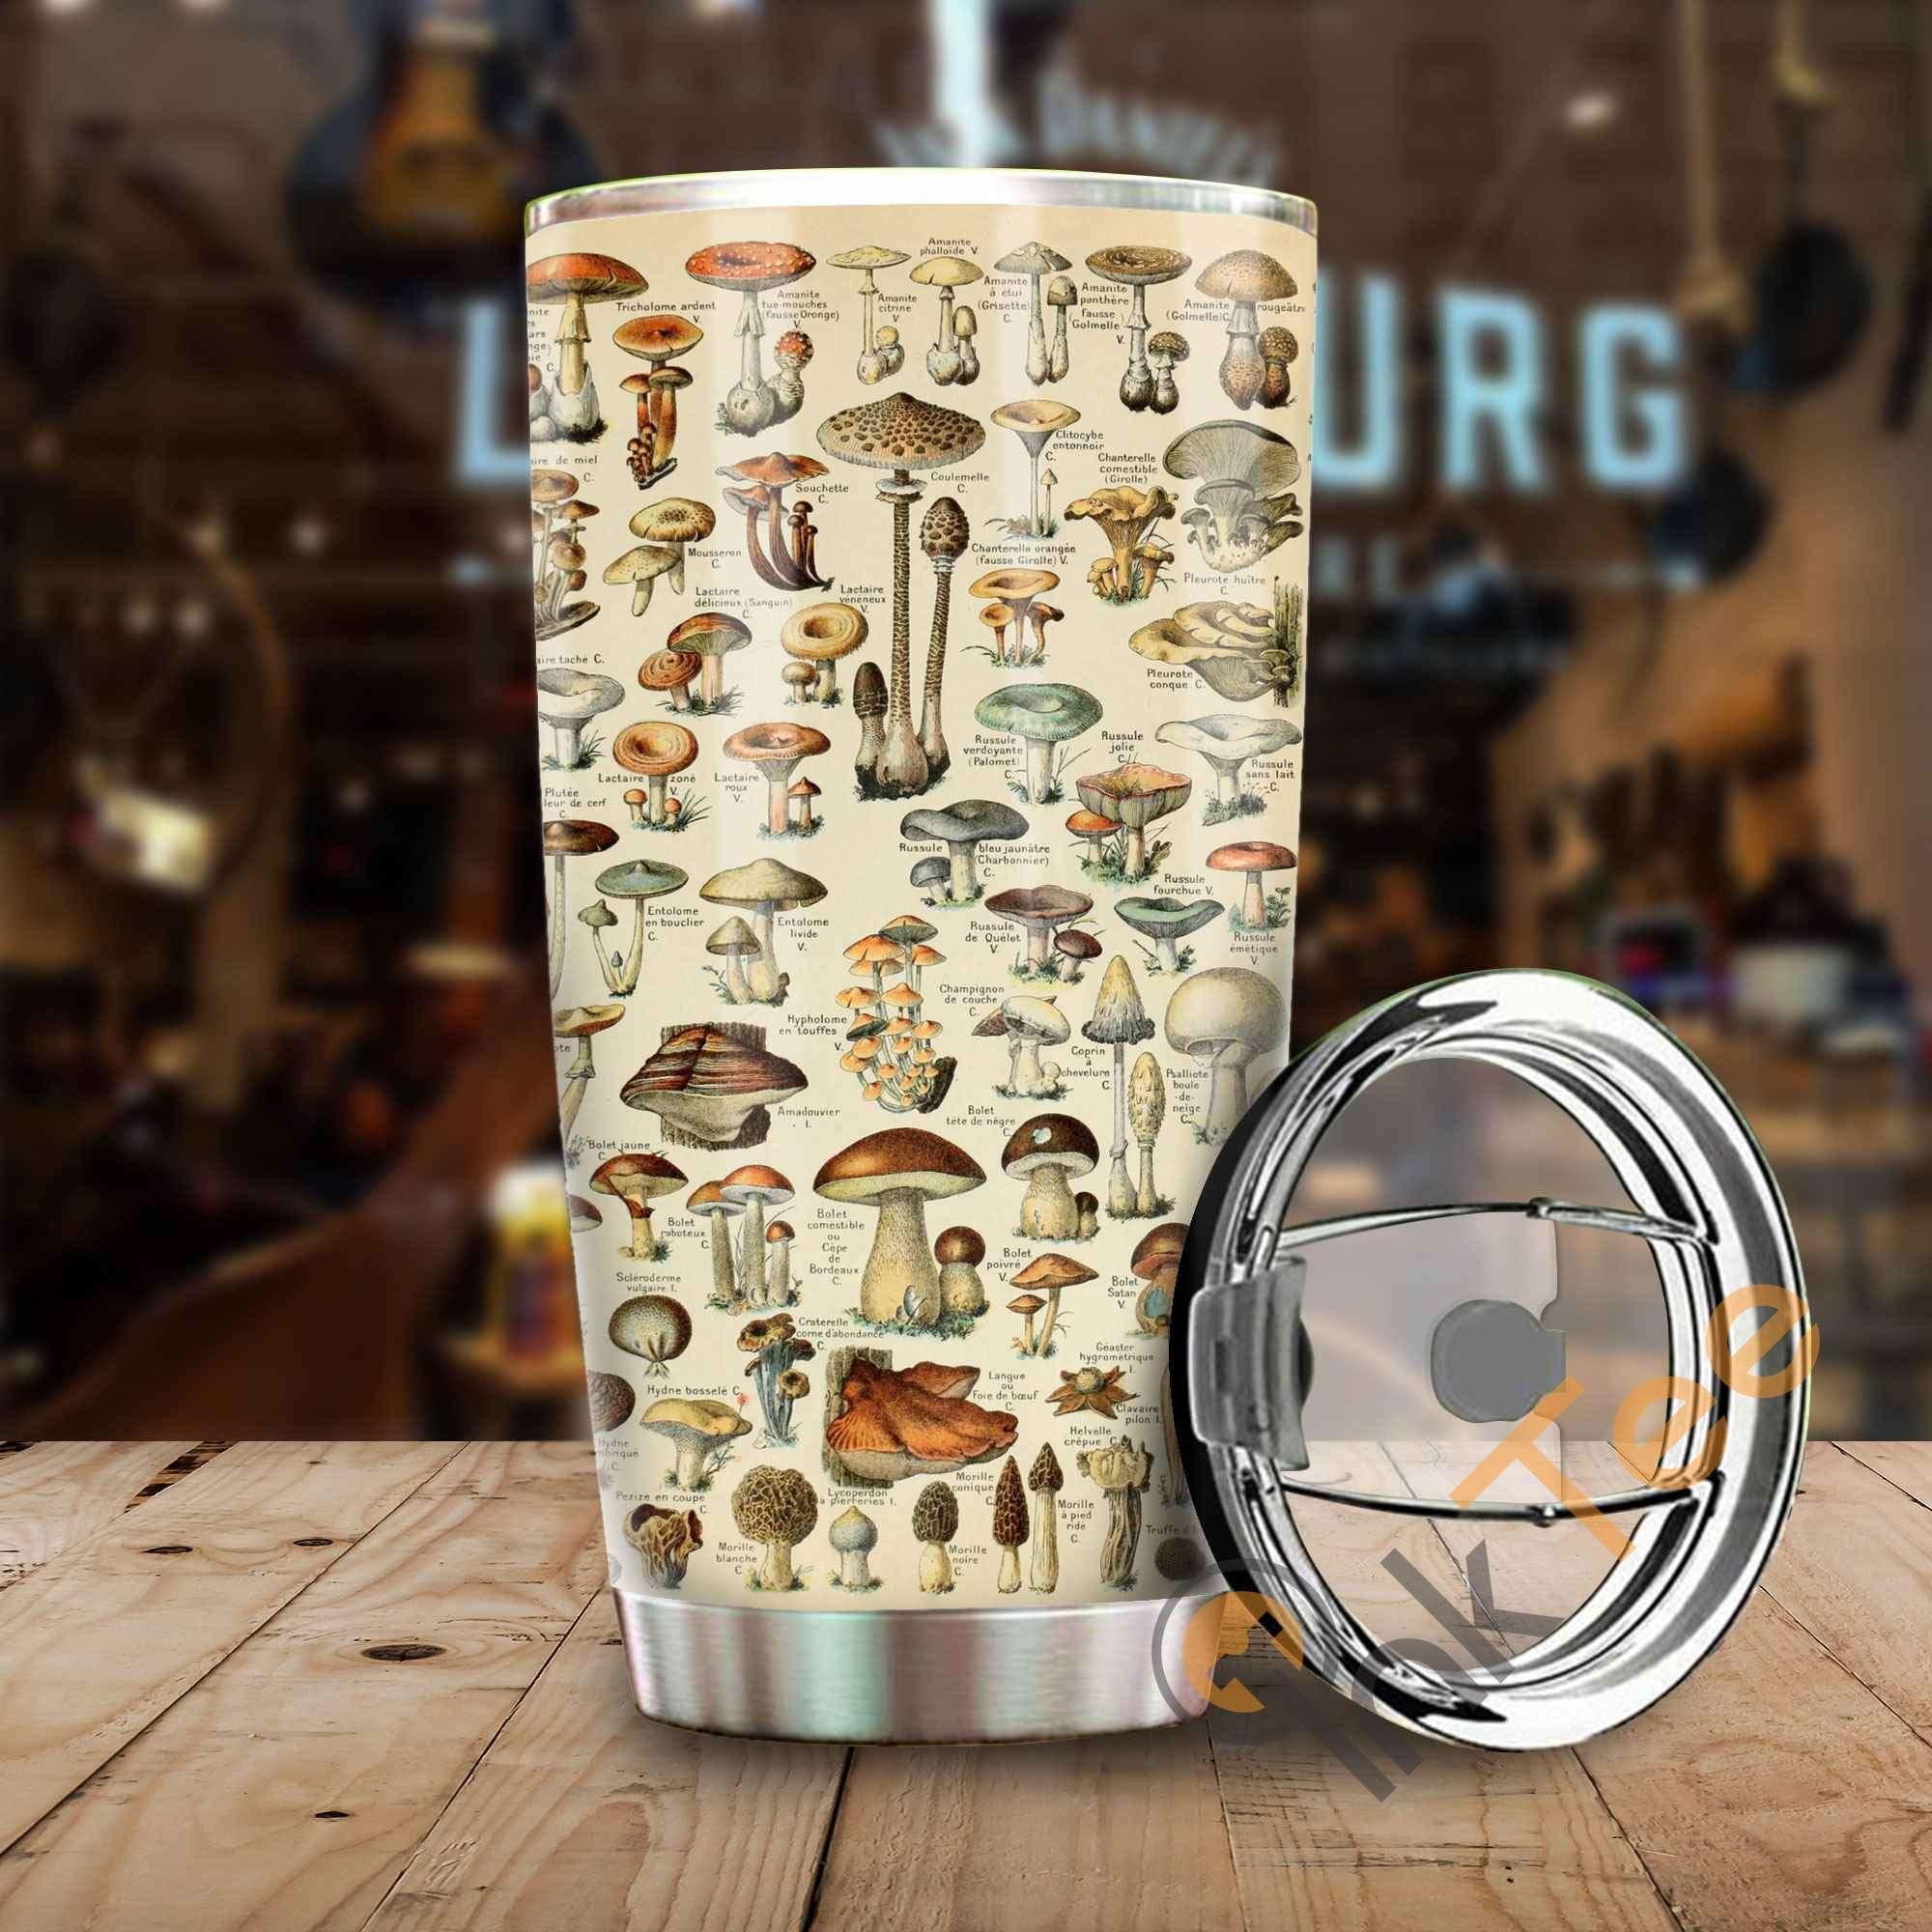 Amazing Mushroom Art Amazon Best Seller Sku 3795 Stainless Steel Tumbler